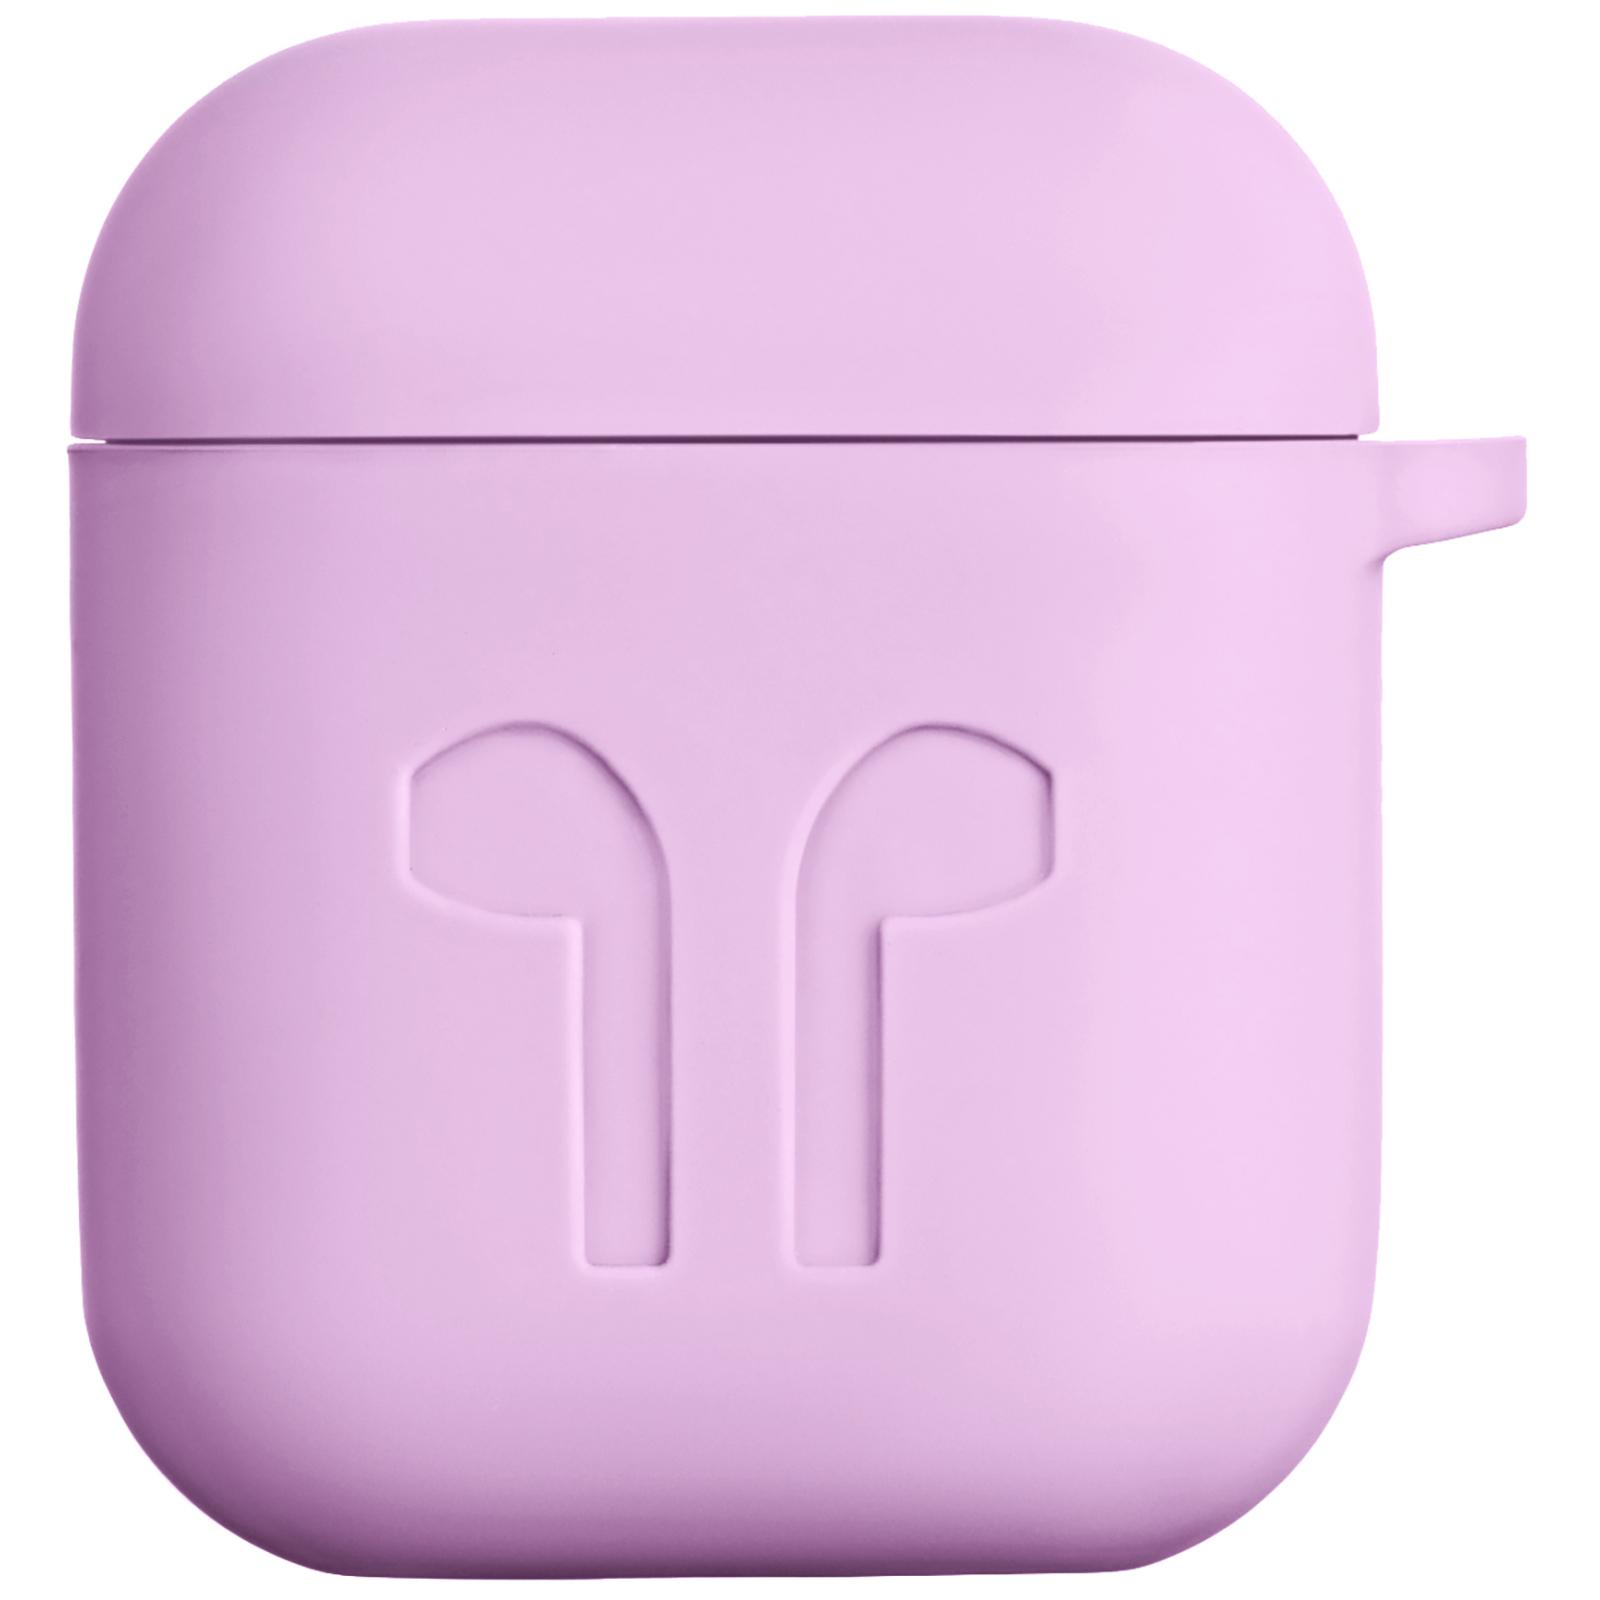 Чохол 2E для Apple AirPods Pure Color Silicone Imprint 1.5 мм Lavende (2E-AIR-PODS-IBSI-1.5-LV)